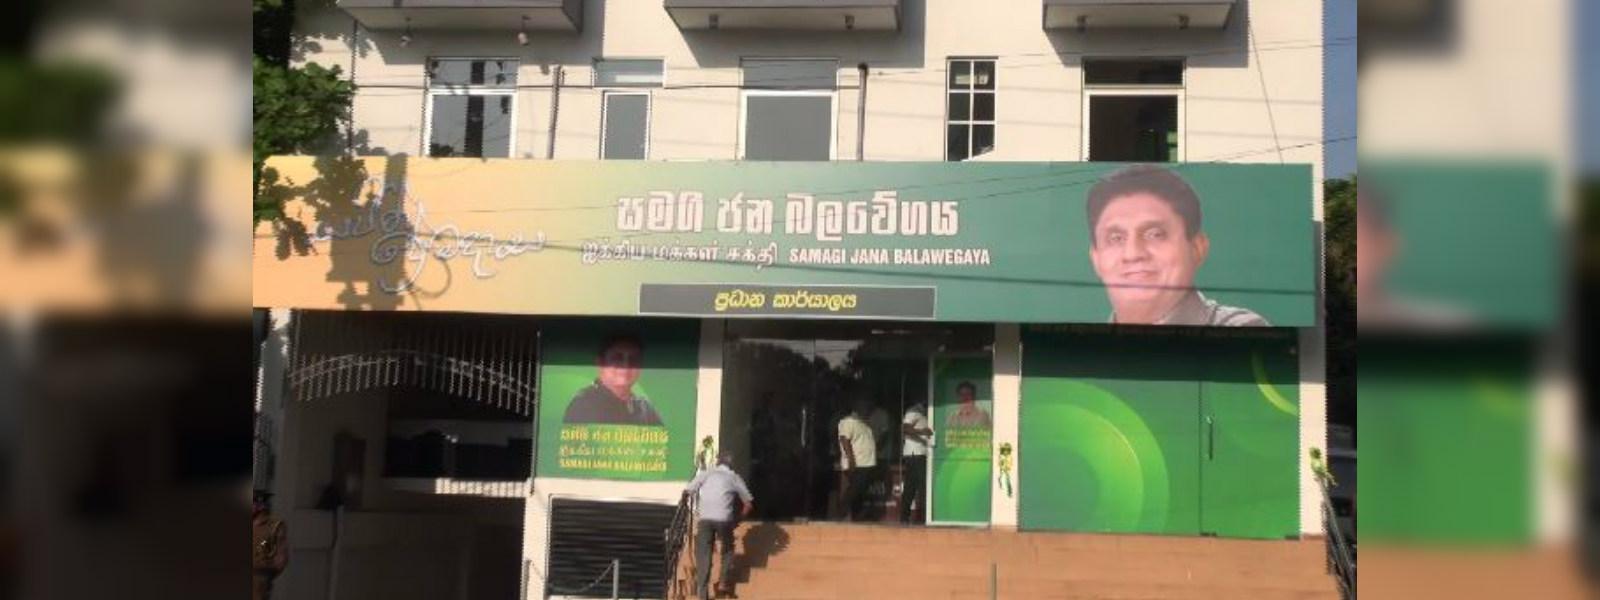 Samagi Jana Balawegaya office declared open